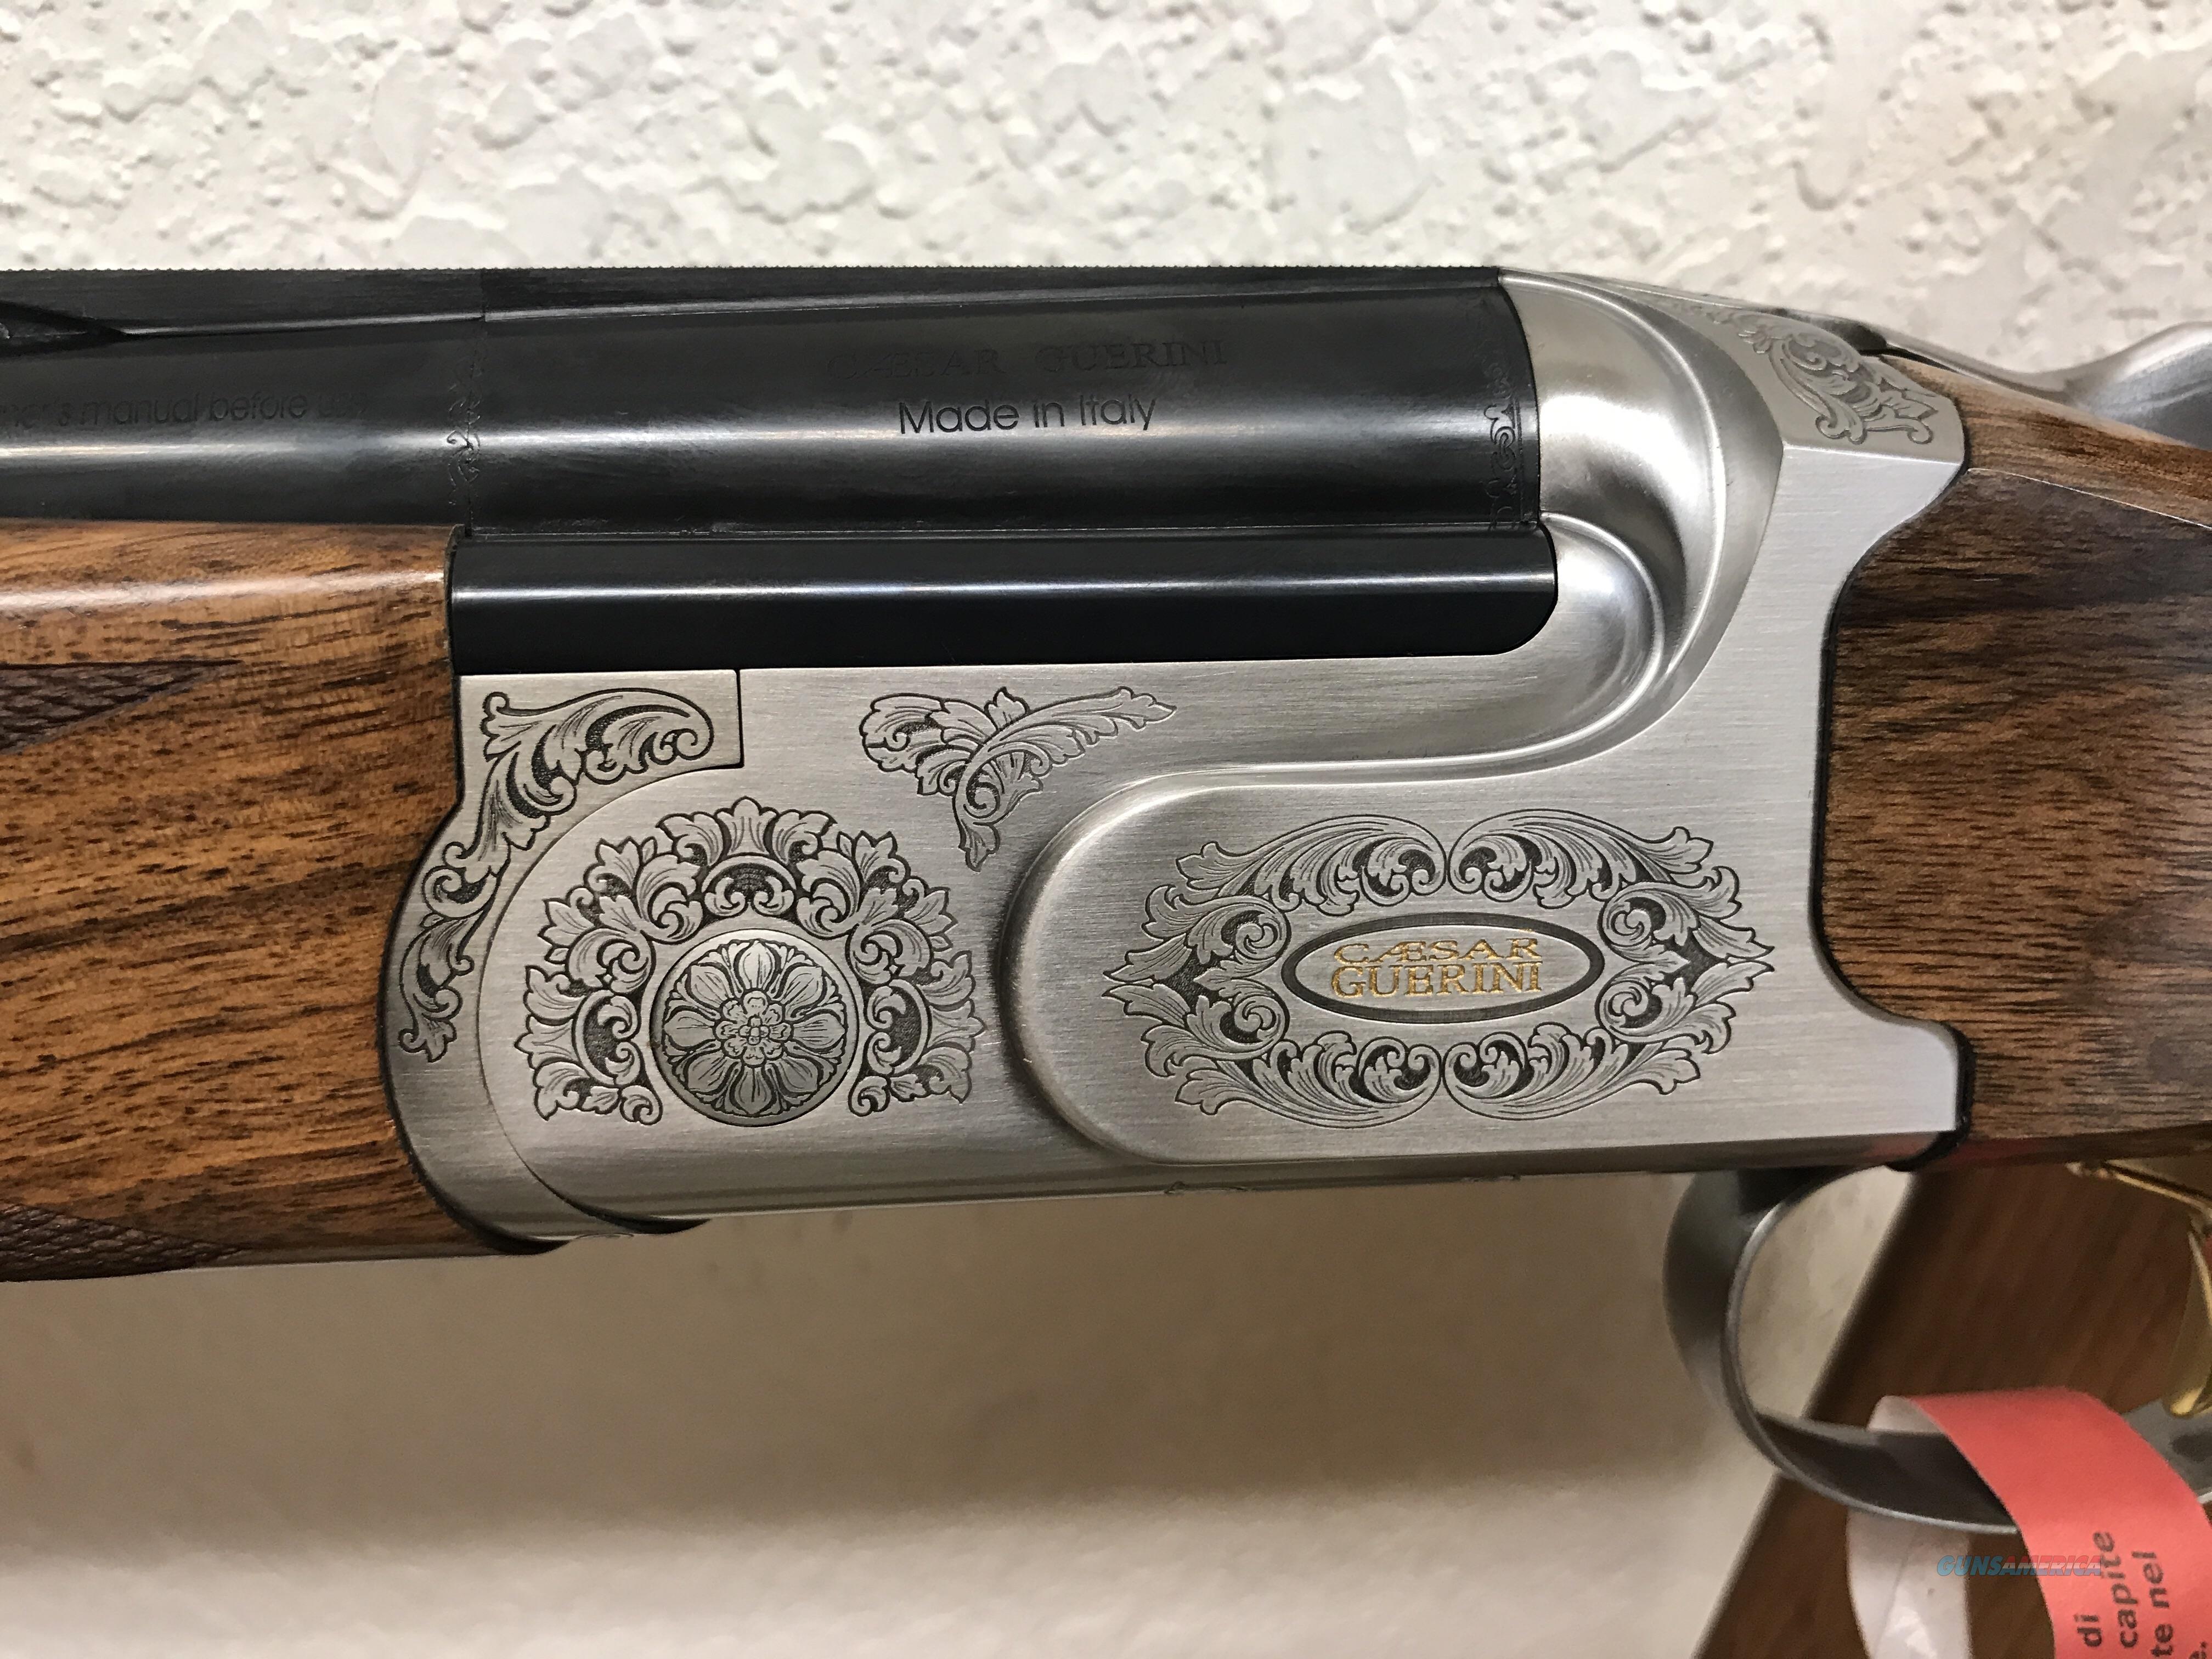 New Guerini Summit Sporter 12 gauge 32 inch over under  Guns > Shotguns > Guerini Shotuns